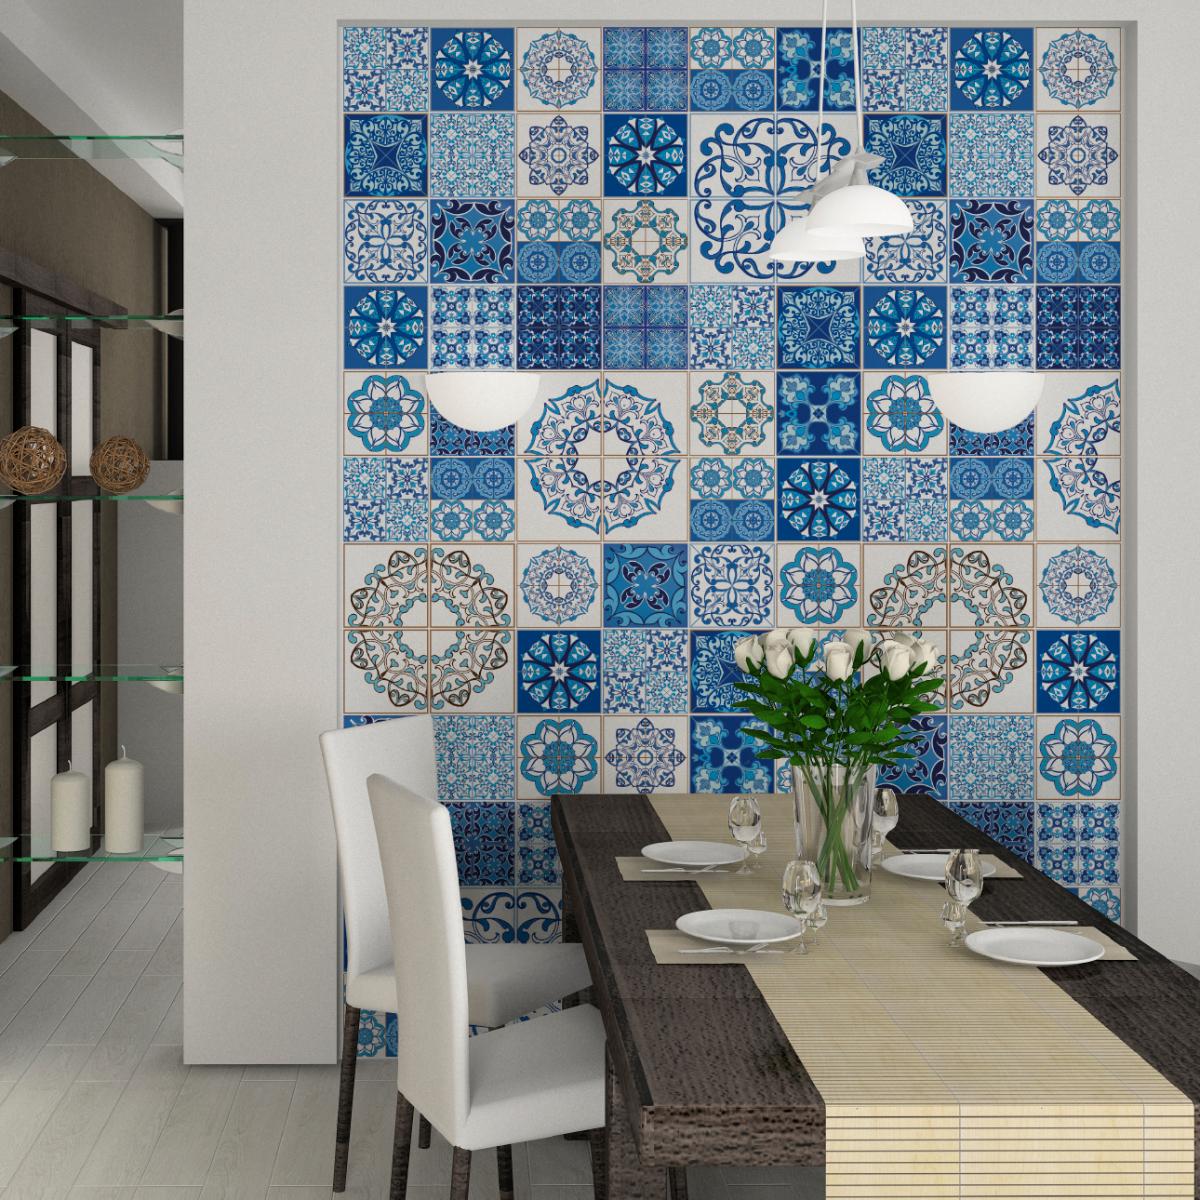 60 stickers carreaux de ciment azulejos serafina salle. Black Bedroom Furniture Sets. Home Design Ideas